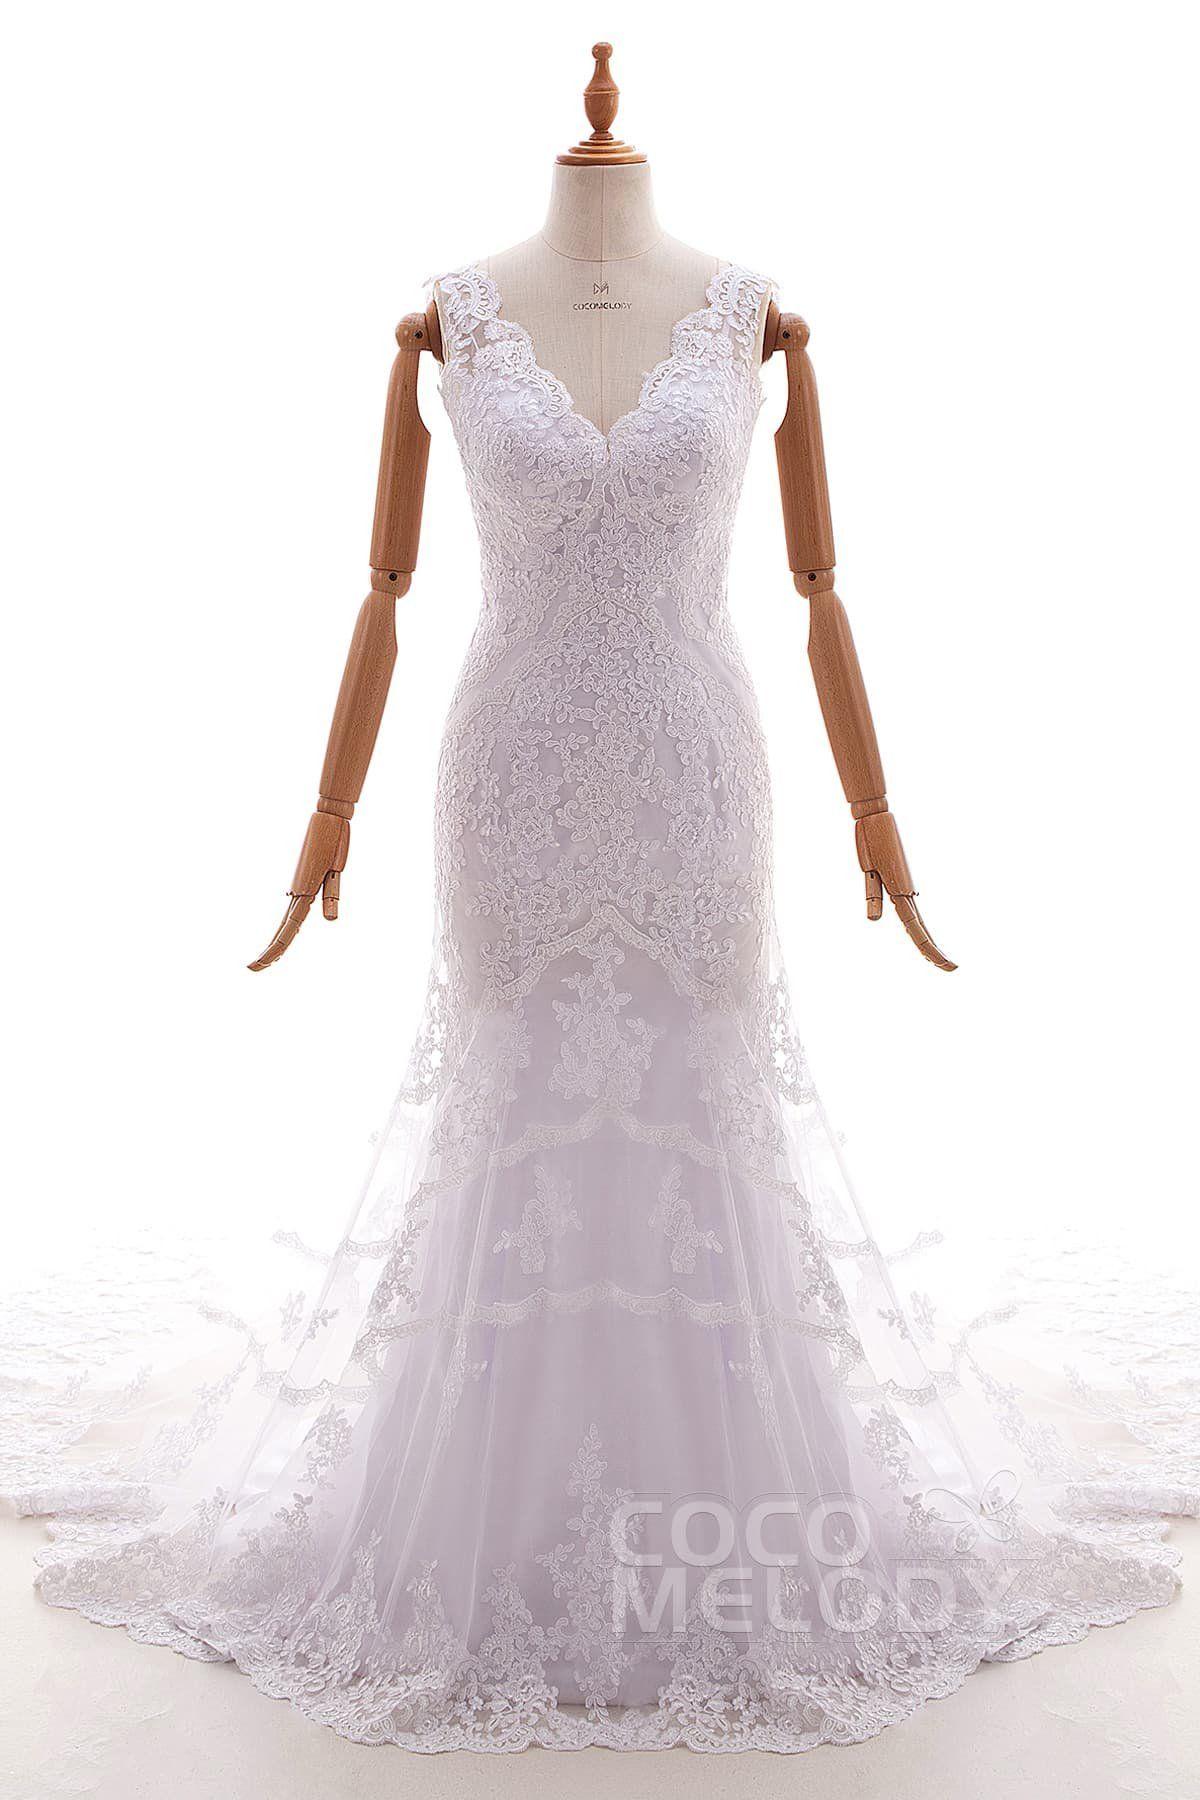 Mermaid dress wedding  TrumpetMermaid Chapel Train Tulle and Lace Wedding Dress LD